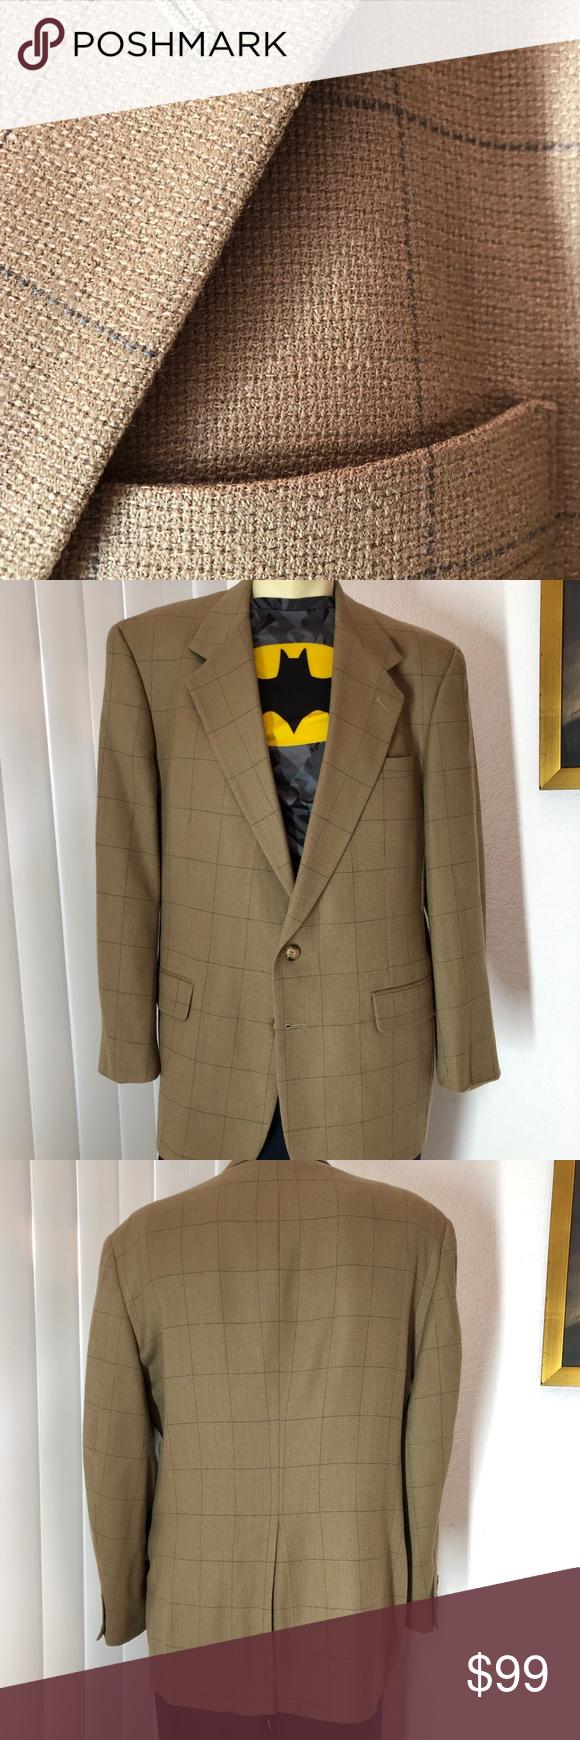 Austin Reed Silk Blazer Made In Usa 42r Austin Reed Blazer Clothes Design